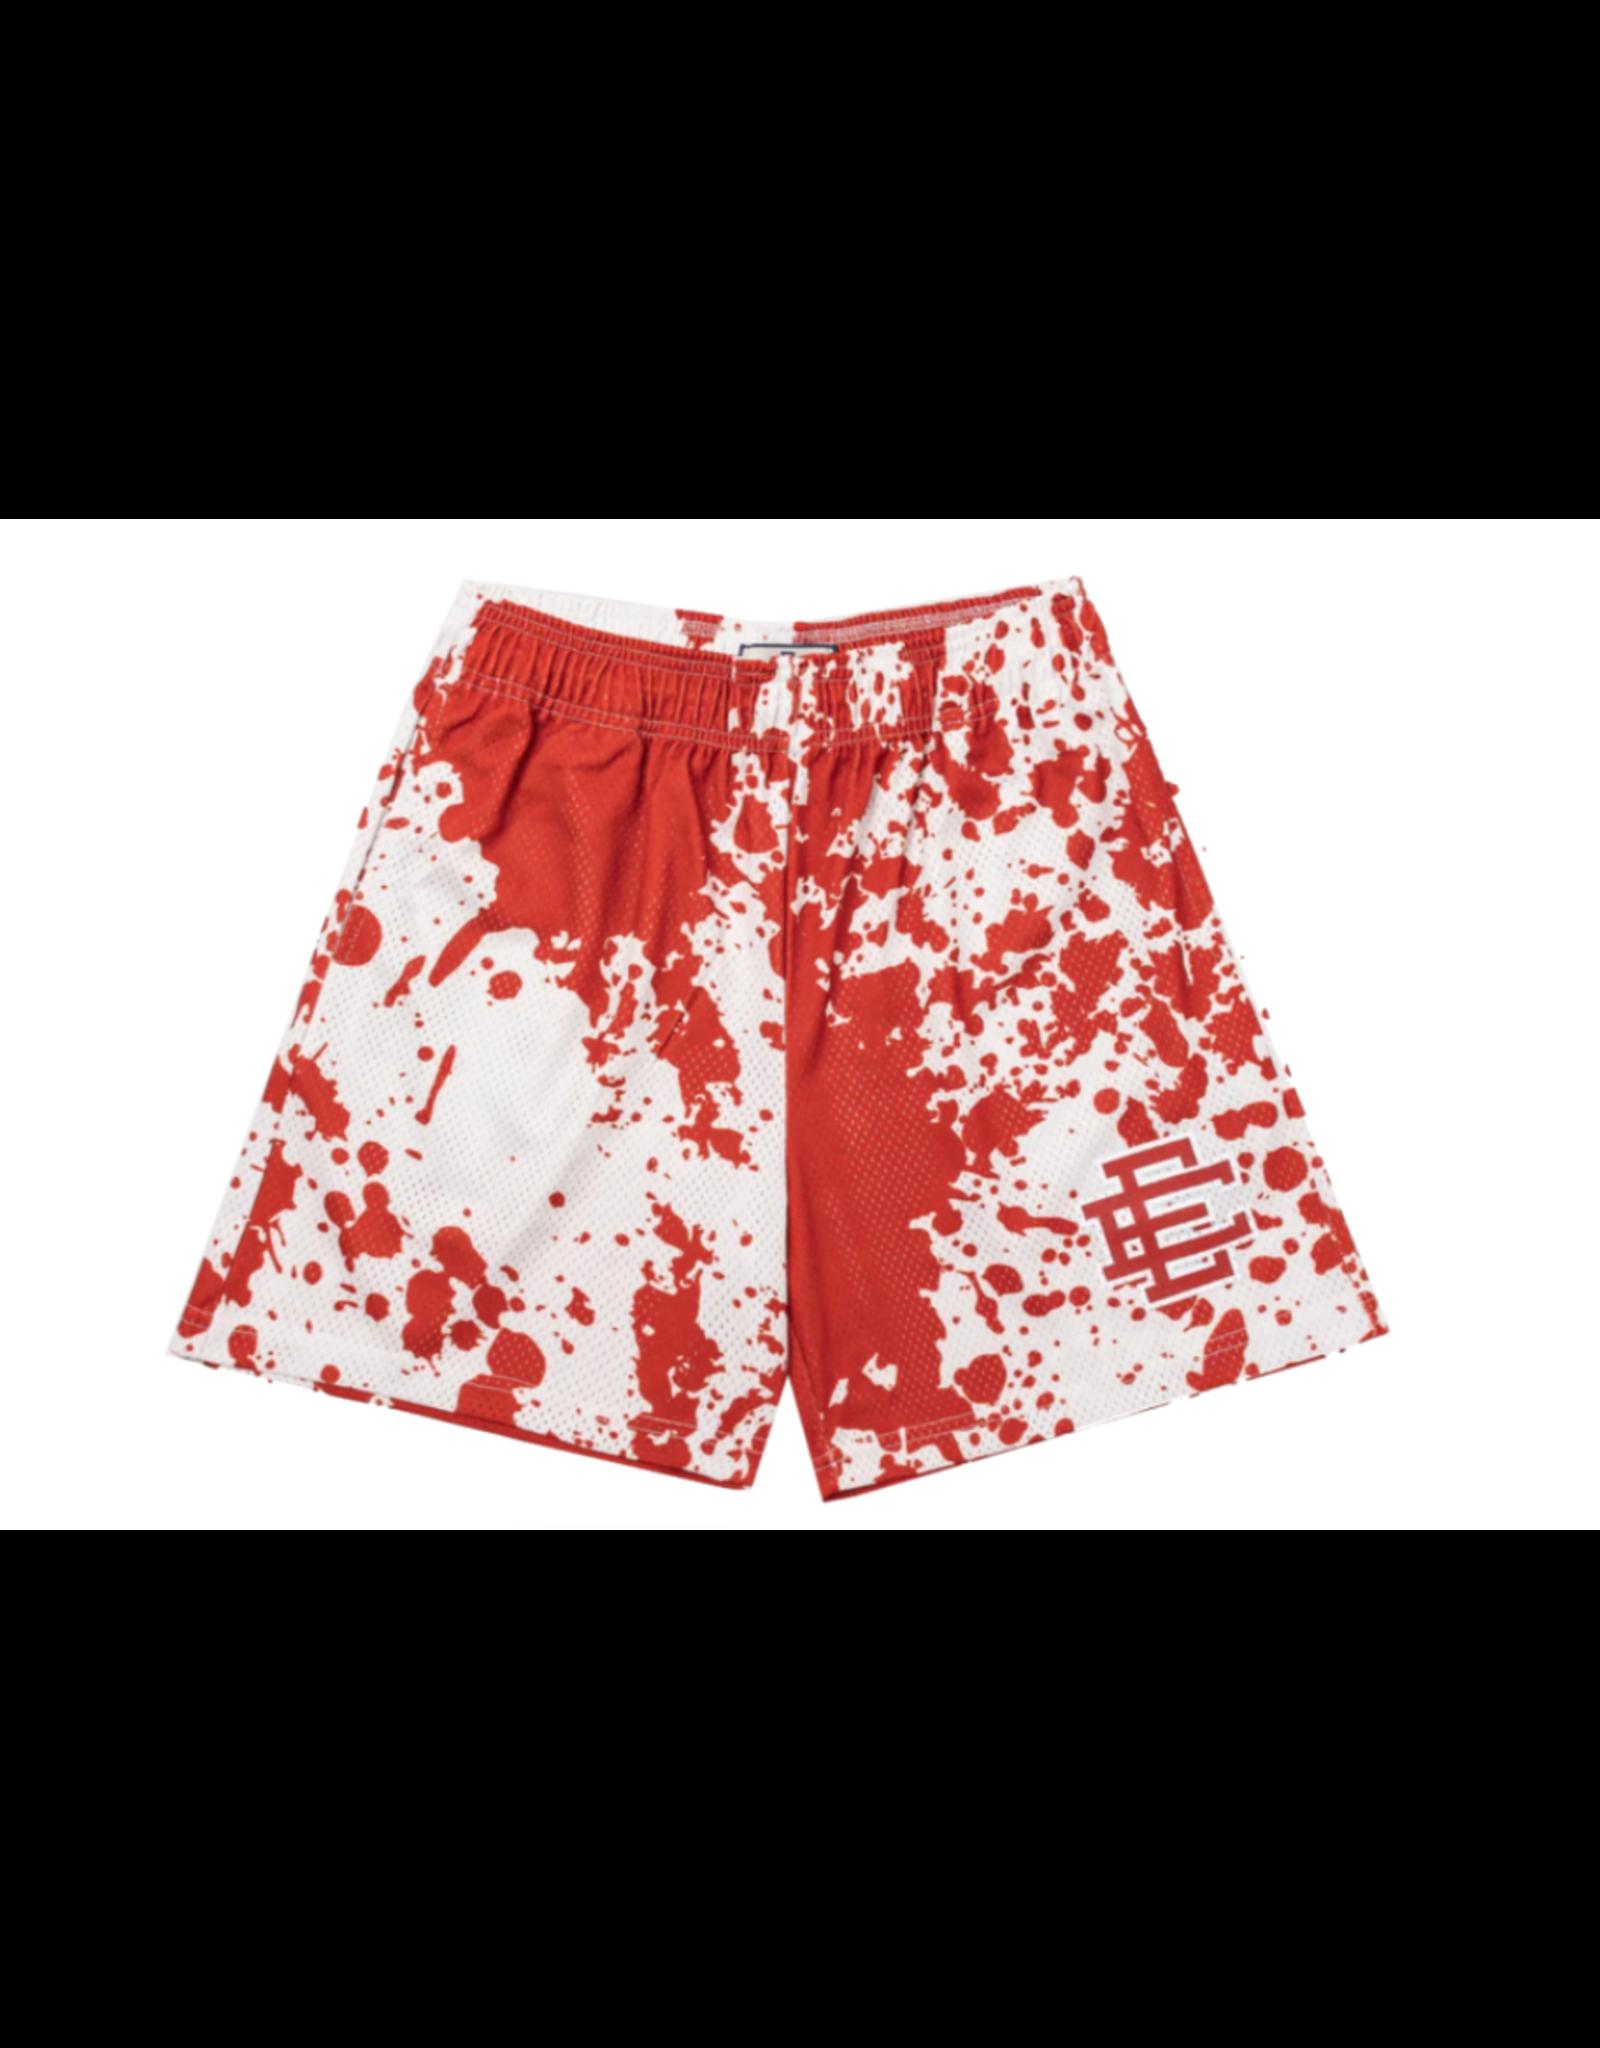 ERIC EMANUEL Eric Emanuel EE Basic Short Red Paint Spill MED